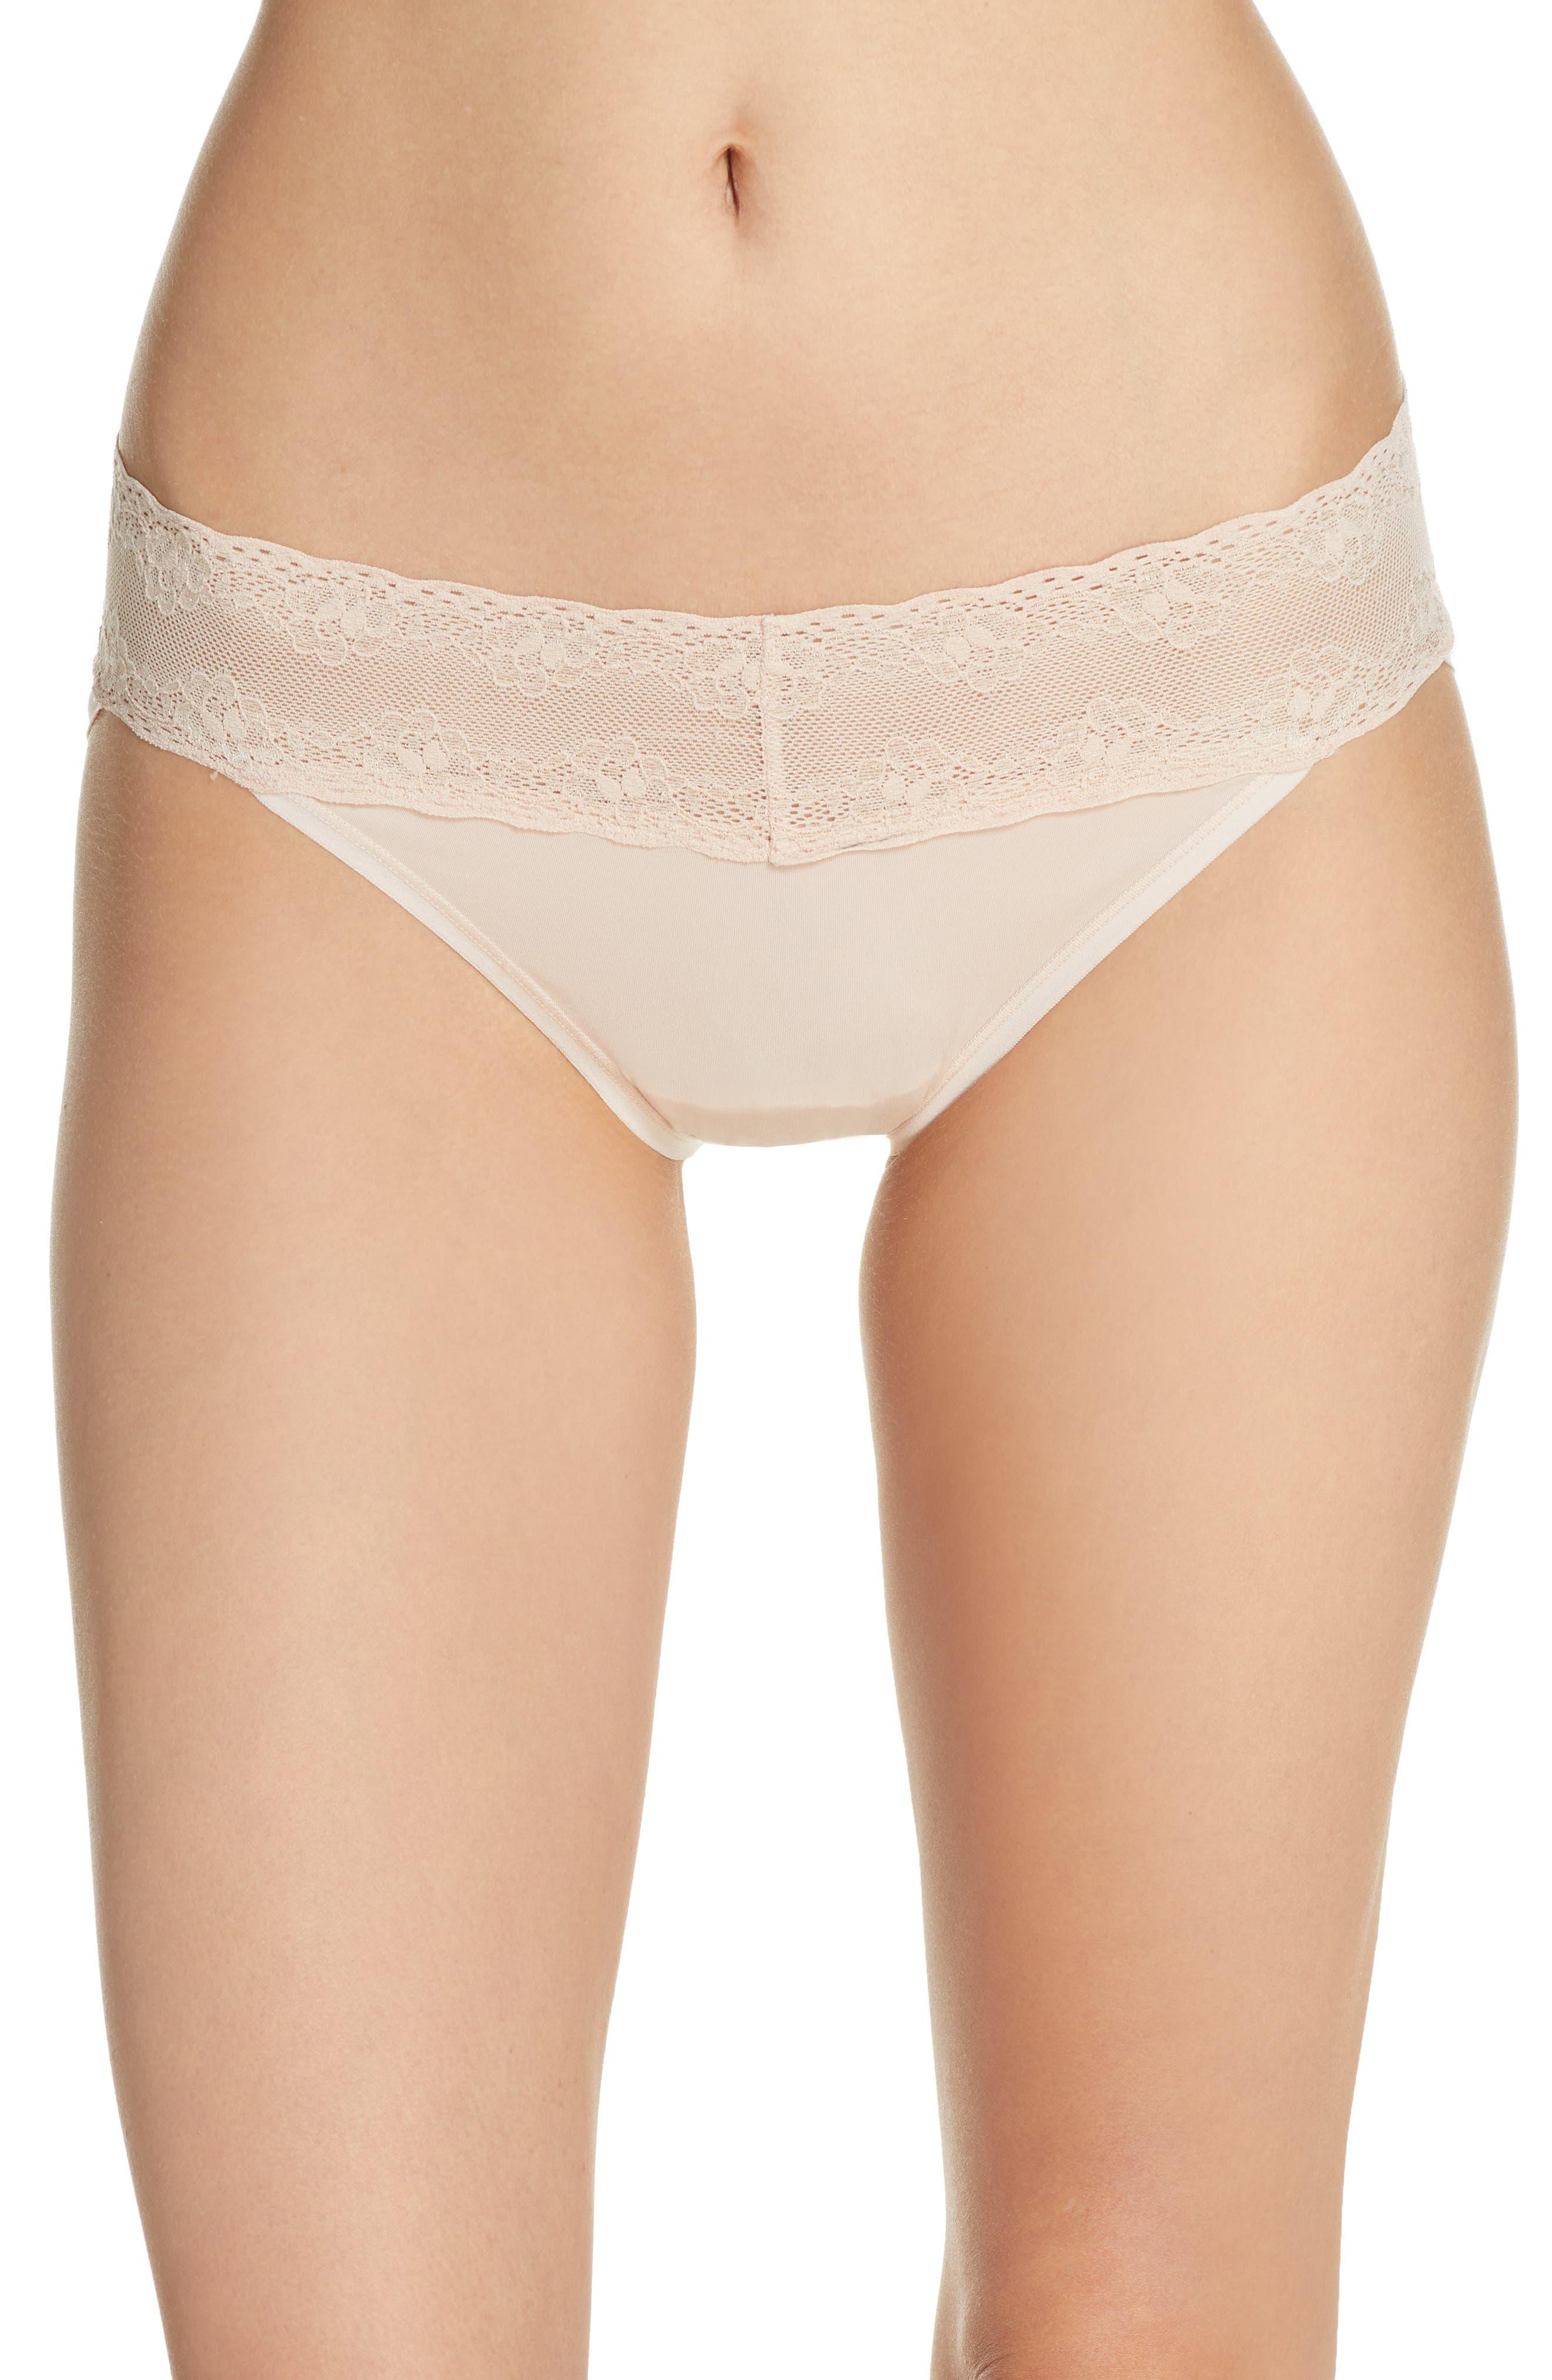 Sexy Jean Anderson nudes (59 photo) Porno, YouTube, braless